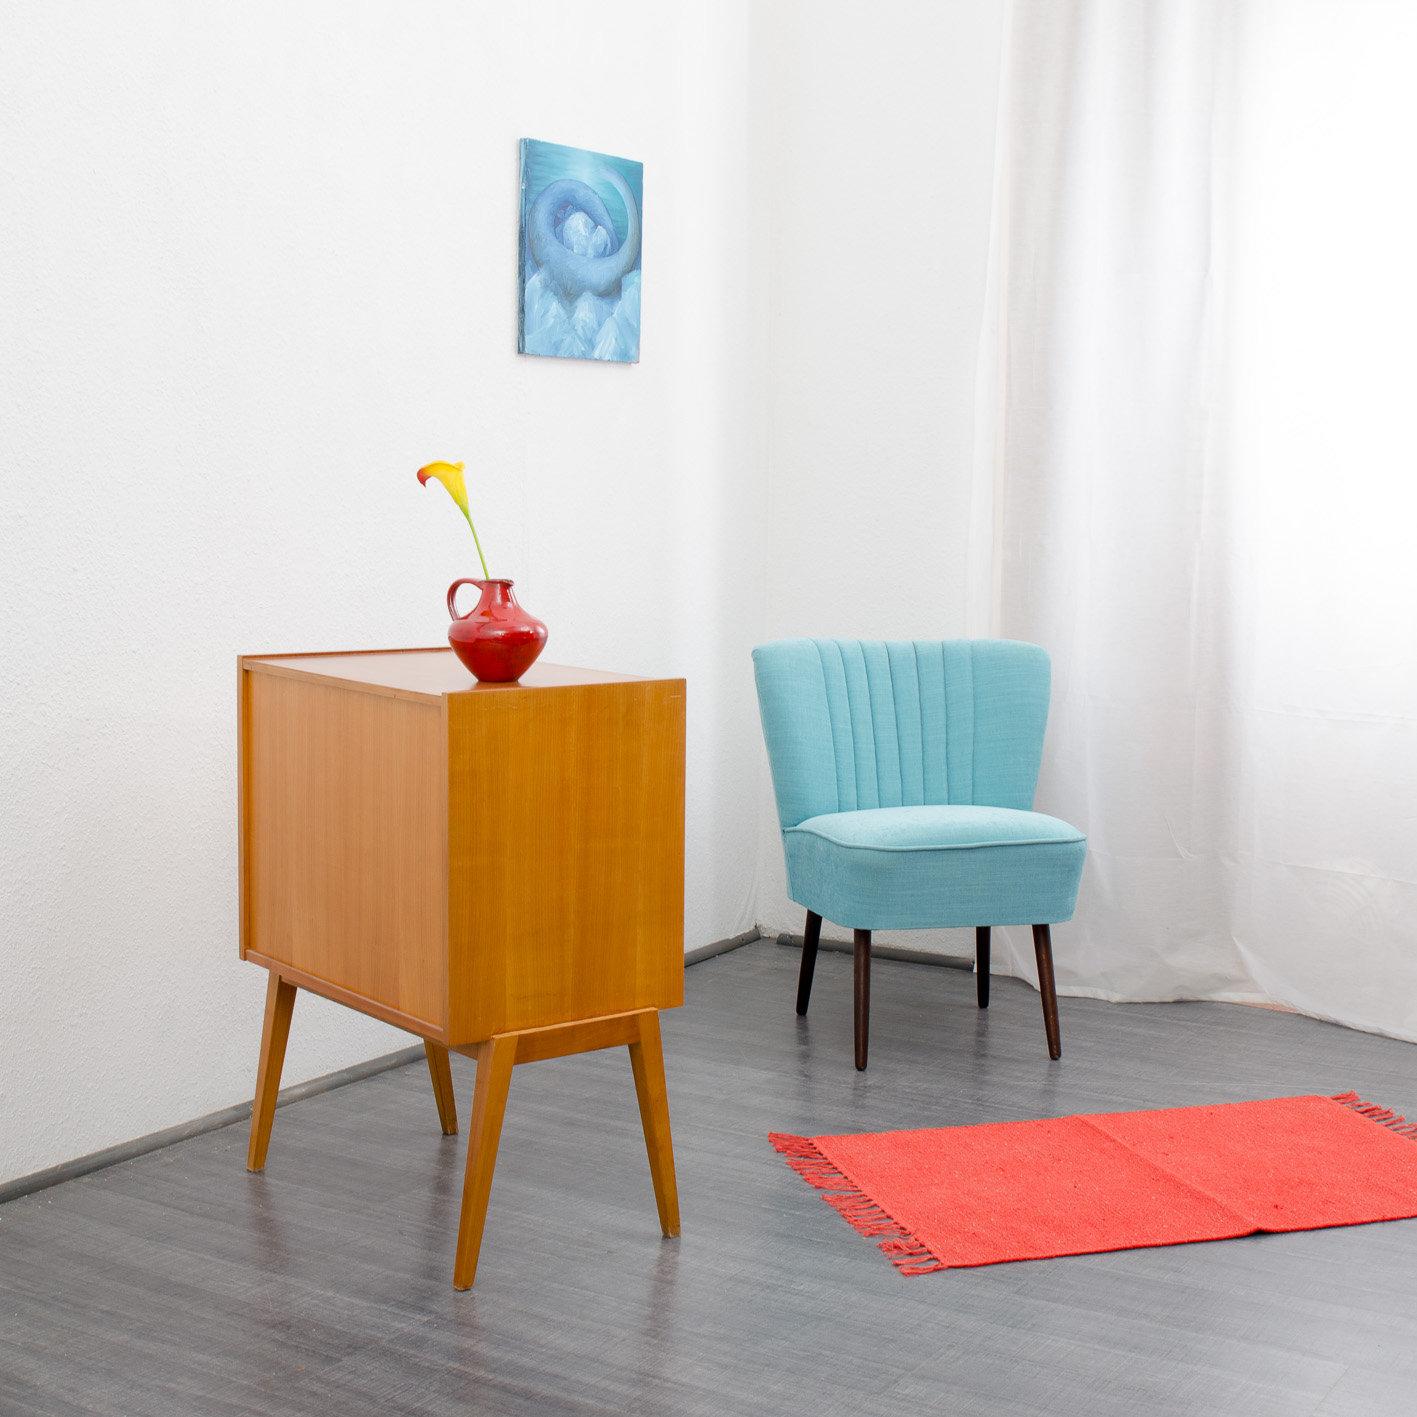 Deconet negozi vintage online - Mobili scandinavi ...